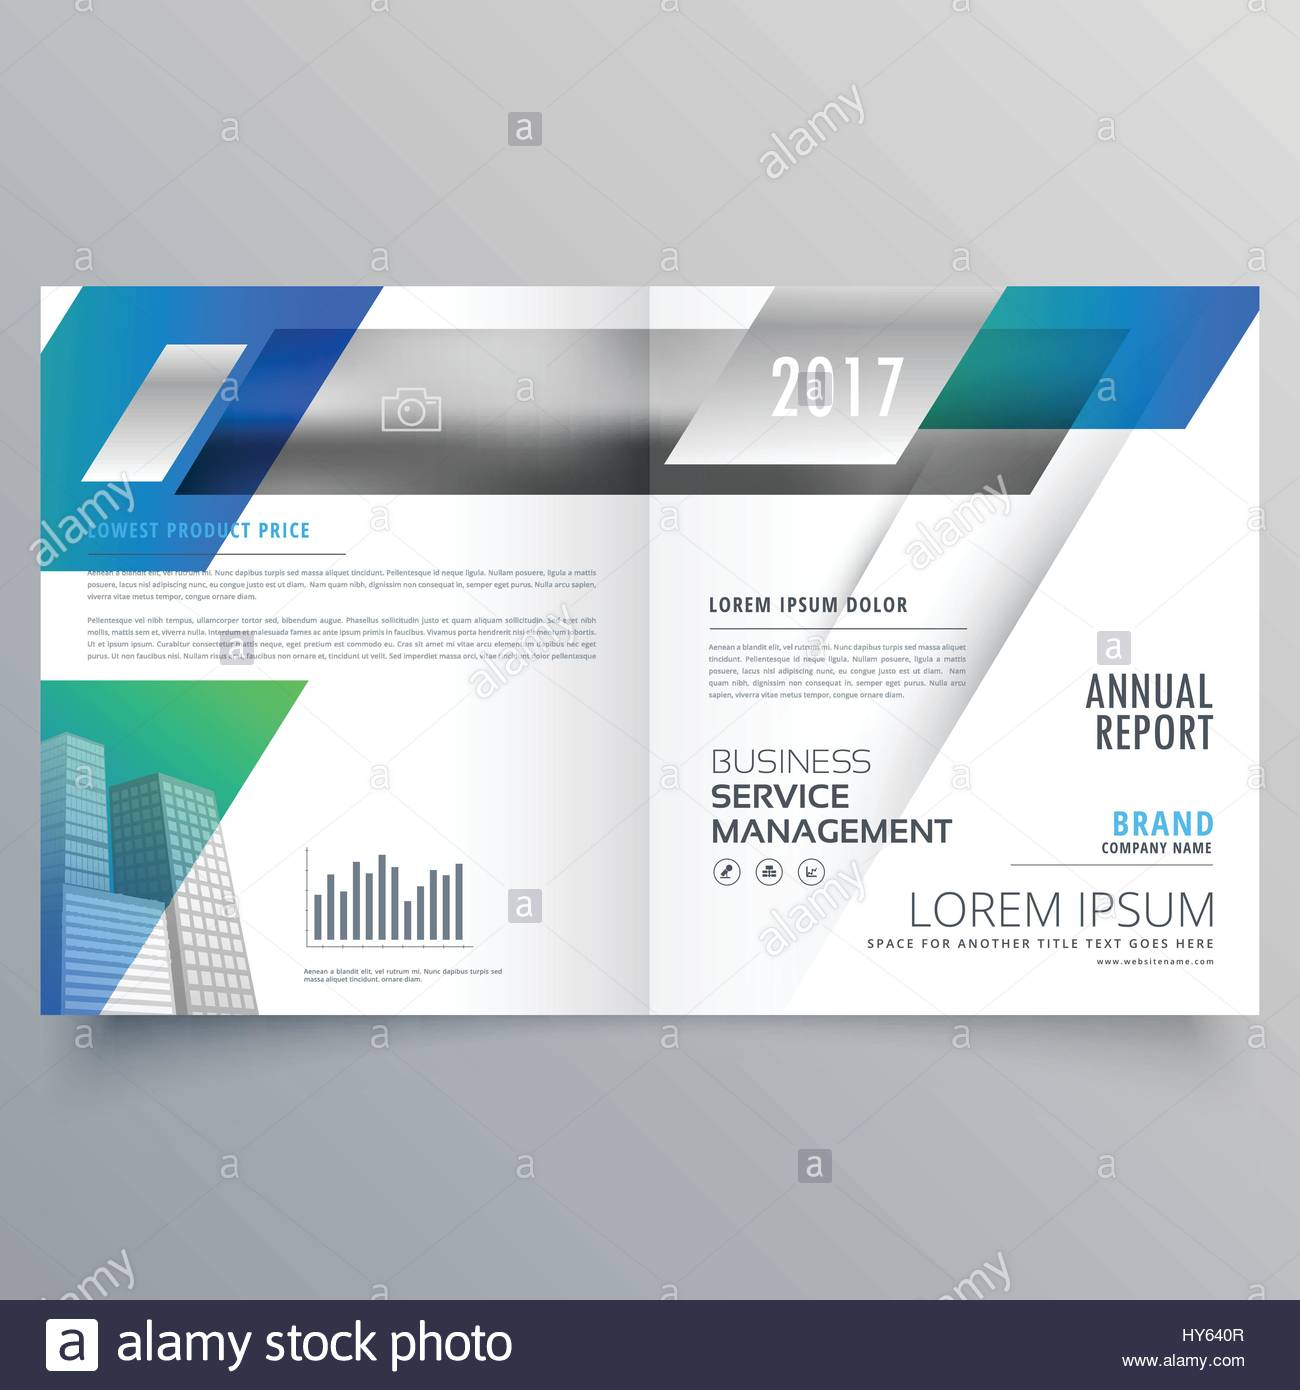 Business Bifold Brochure Template Vector Design Stock Vector Art - Bifold brochure template